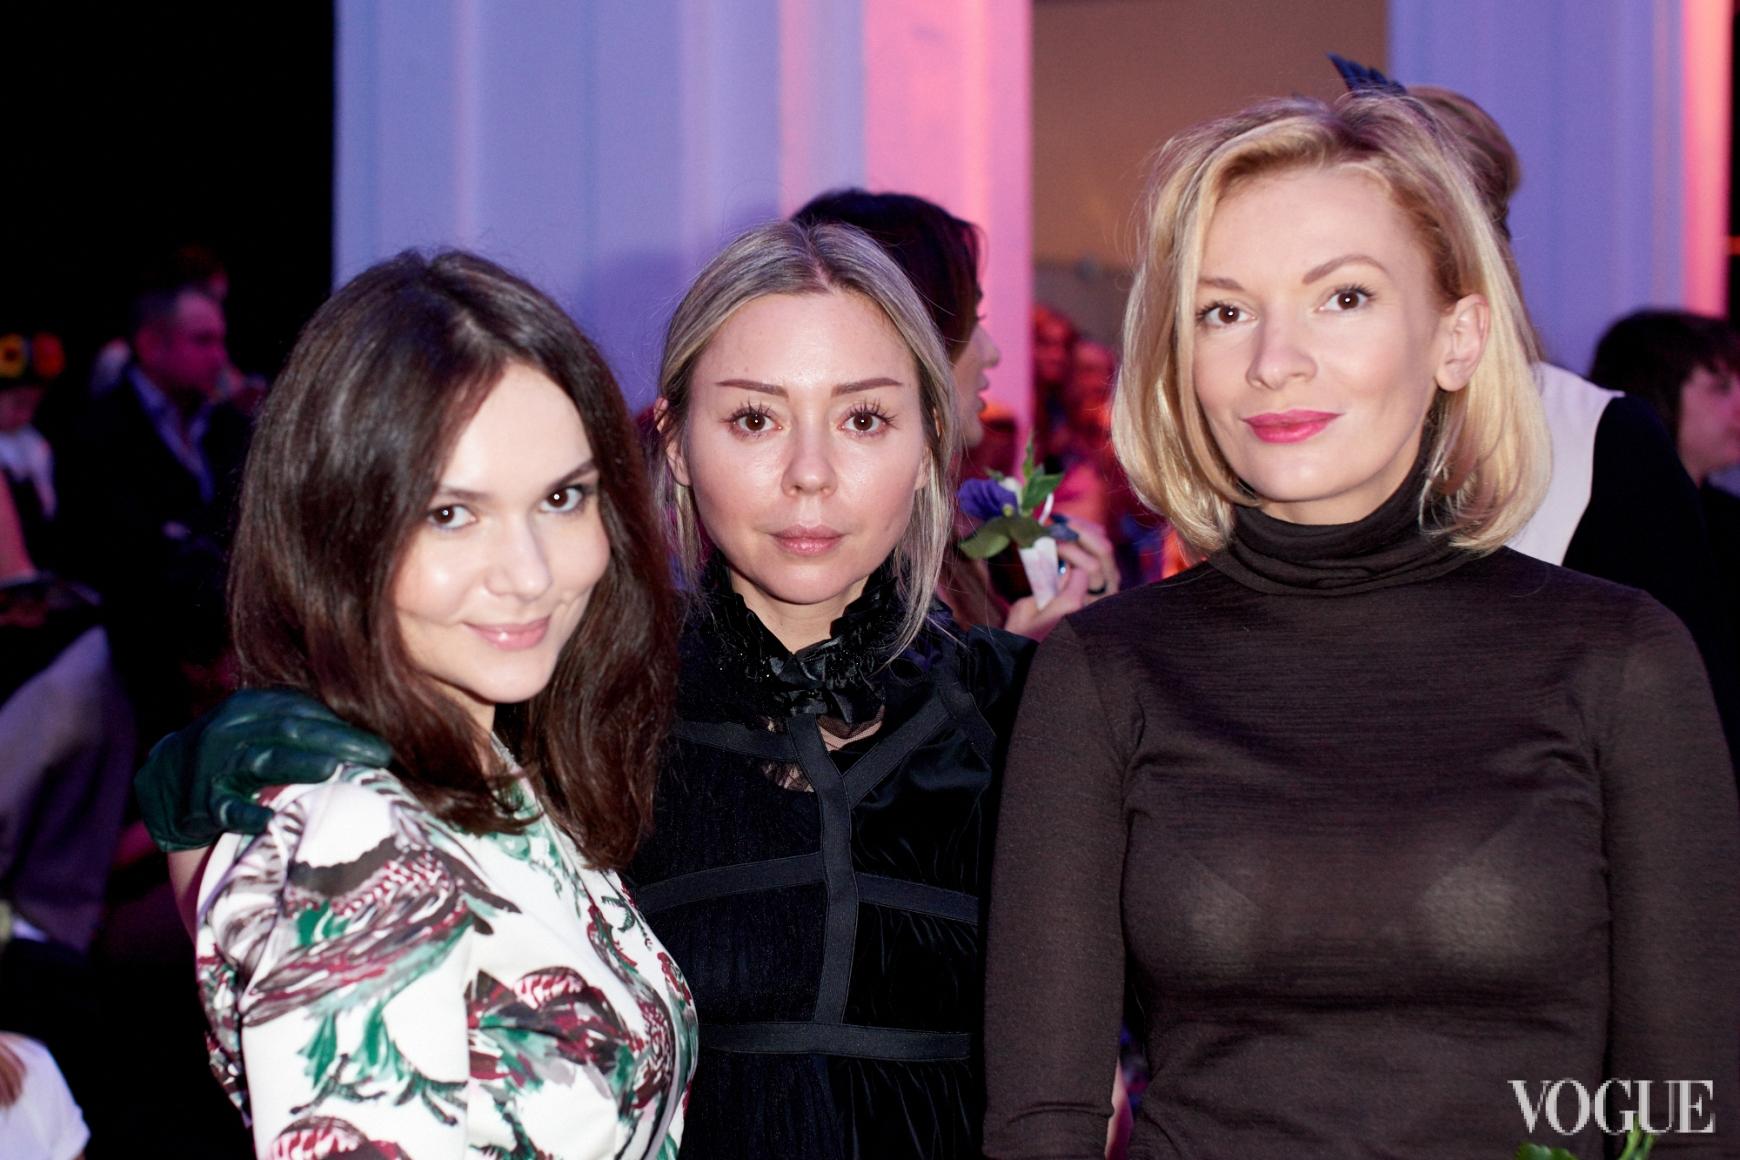 Алена Лавренюк, Оксана Берг, Полина Неня